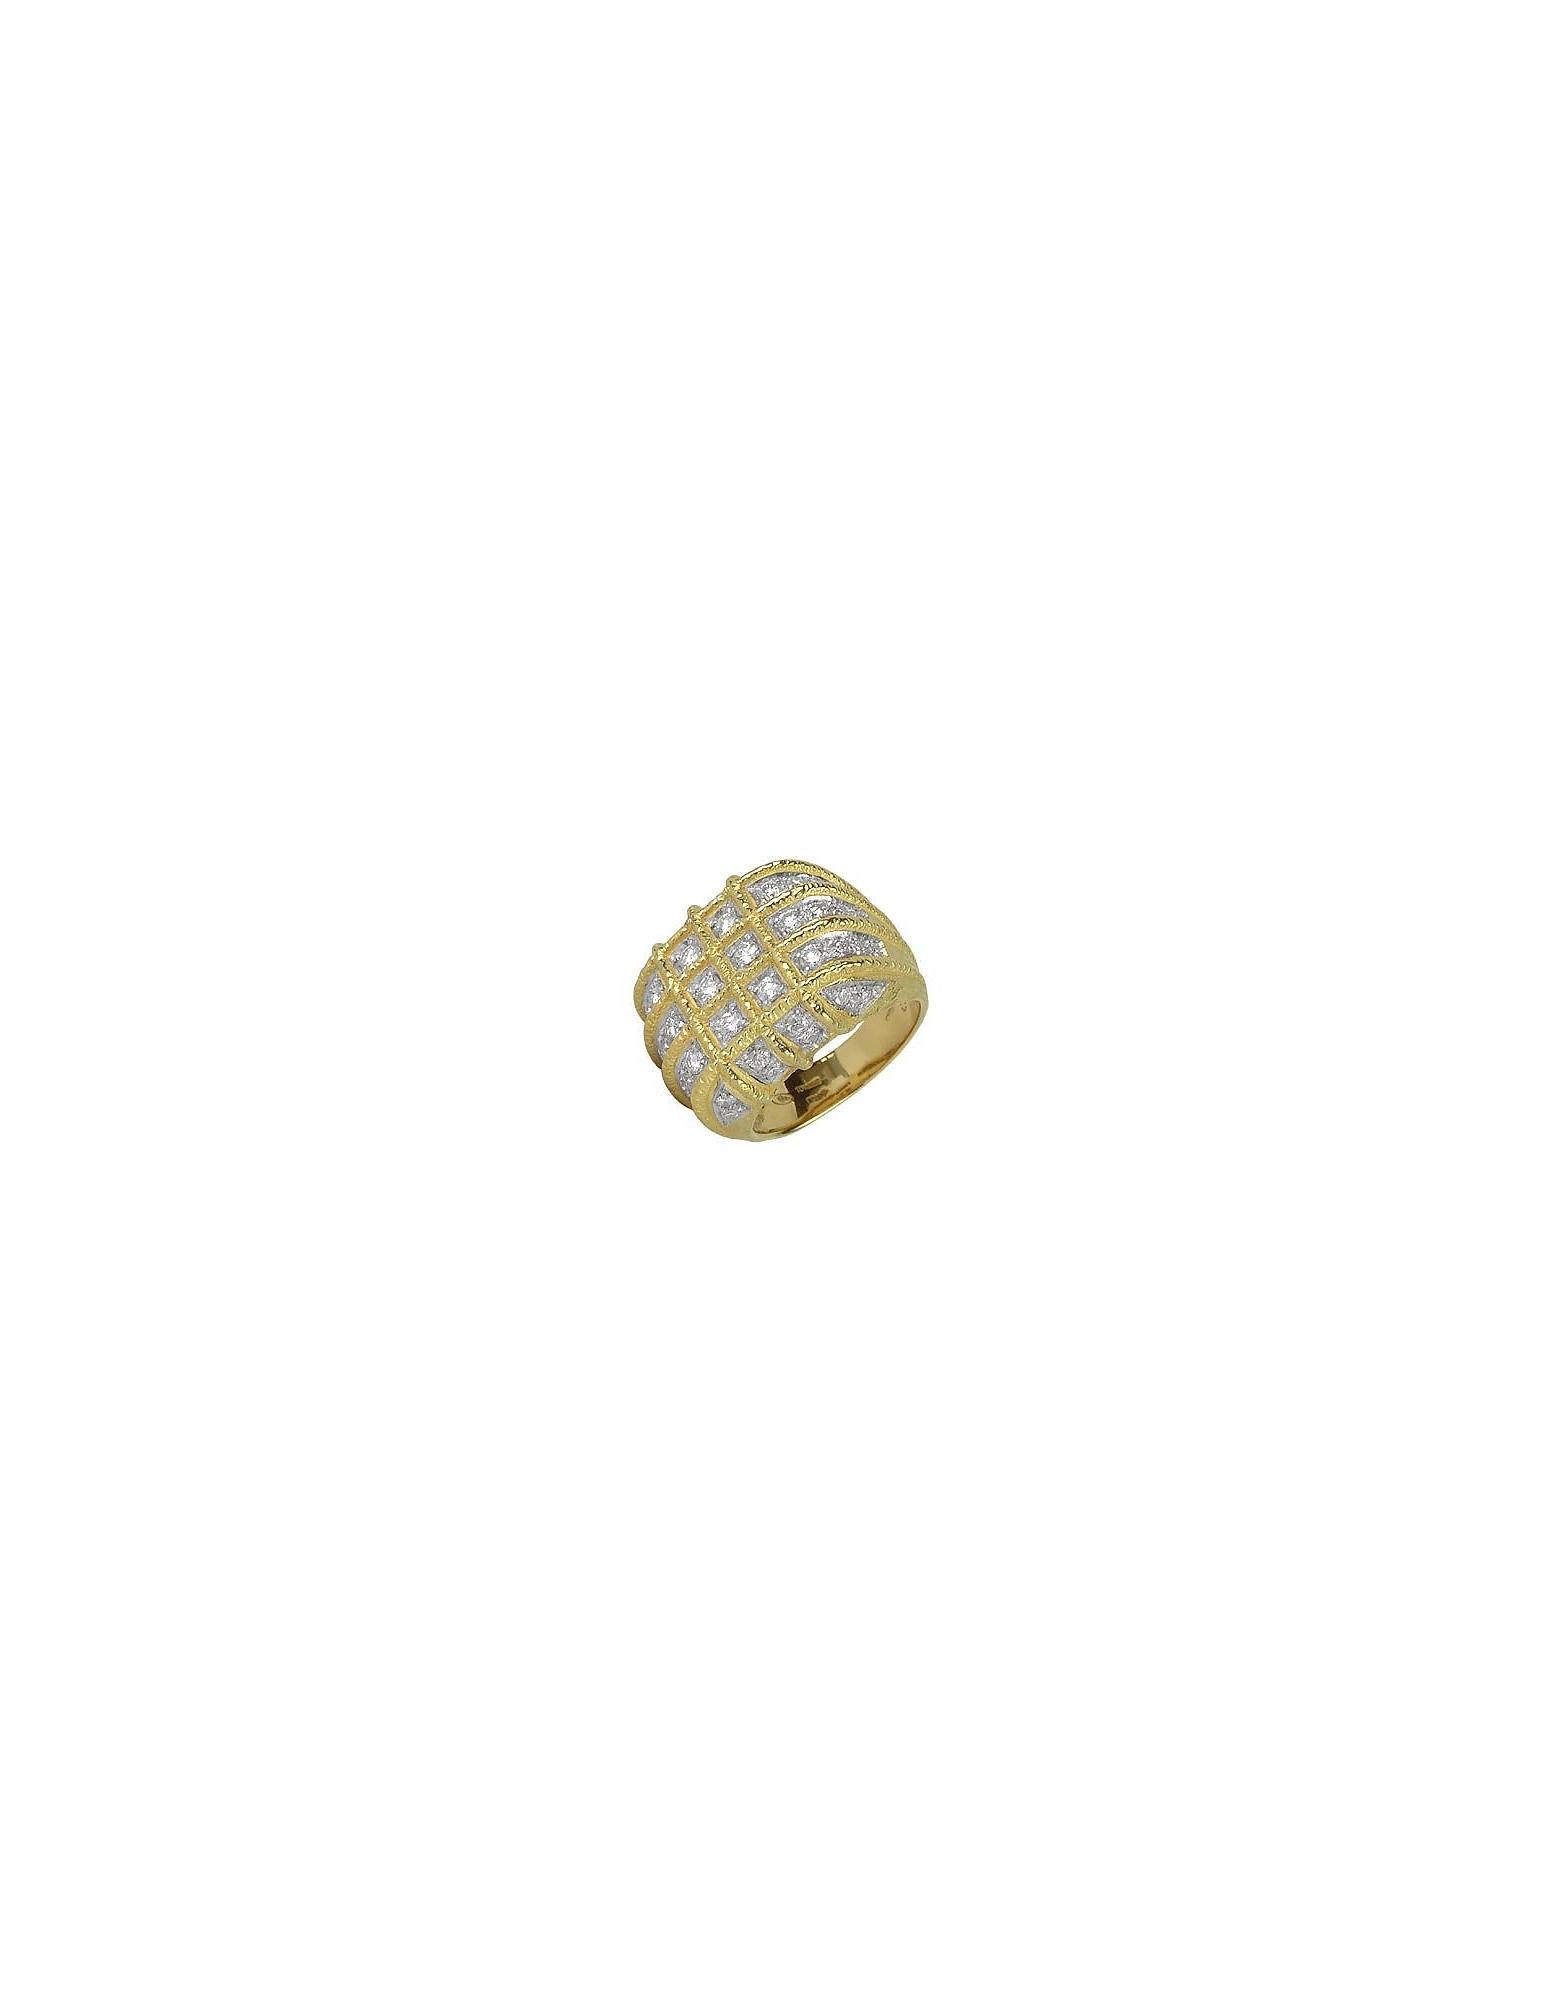 Torrini Rings, Wallstreet - 18K Yellow Gold Diamond Ring